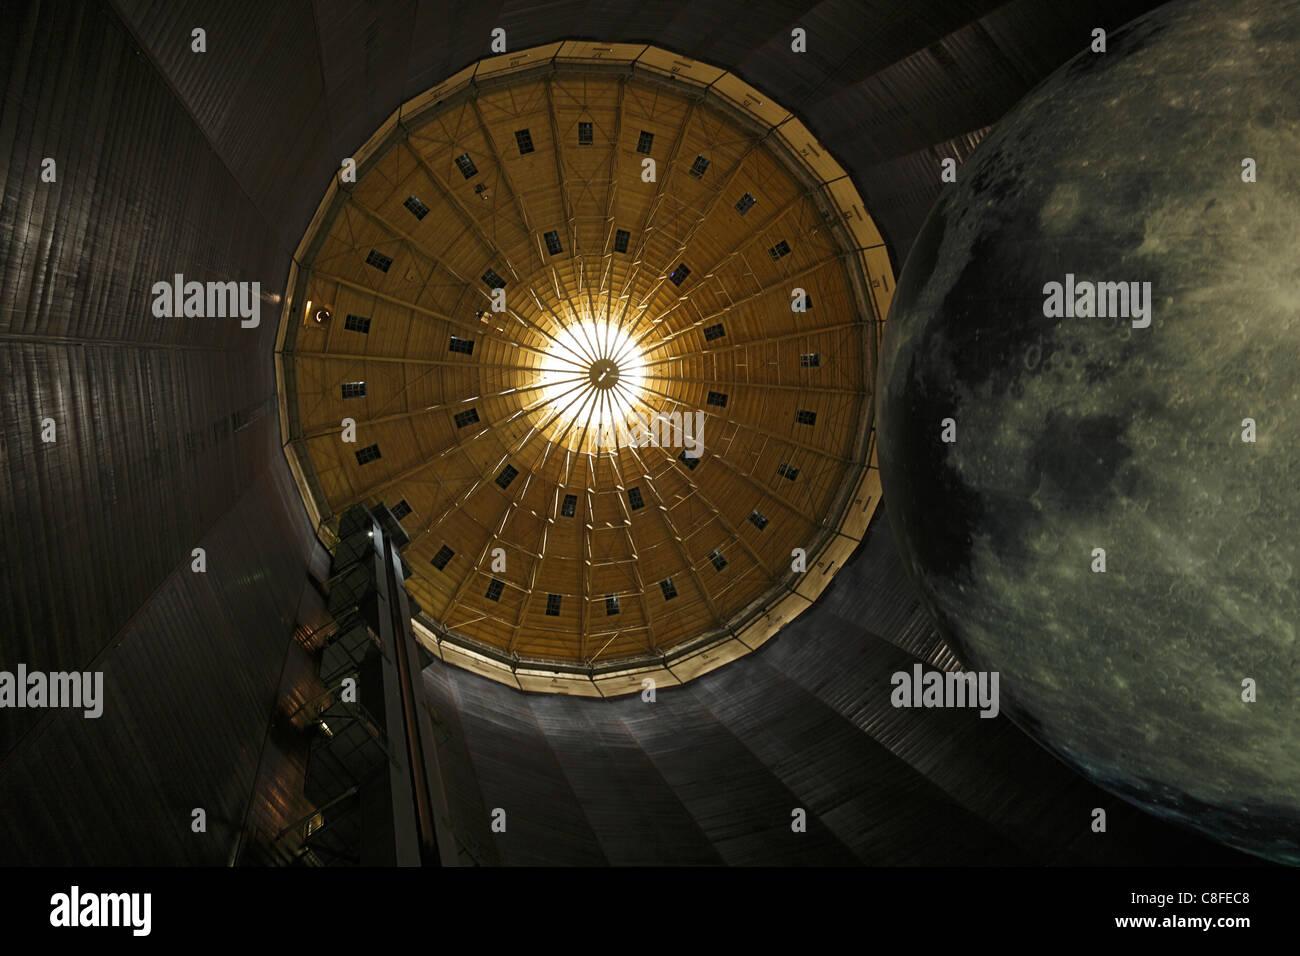 Germany, Europe, Oberhausen, Ruhr area, Lower Rhine, North Rhine-Westphalia, exhibition hall, gasometer, stars, - Stock Image